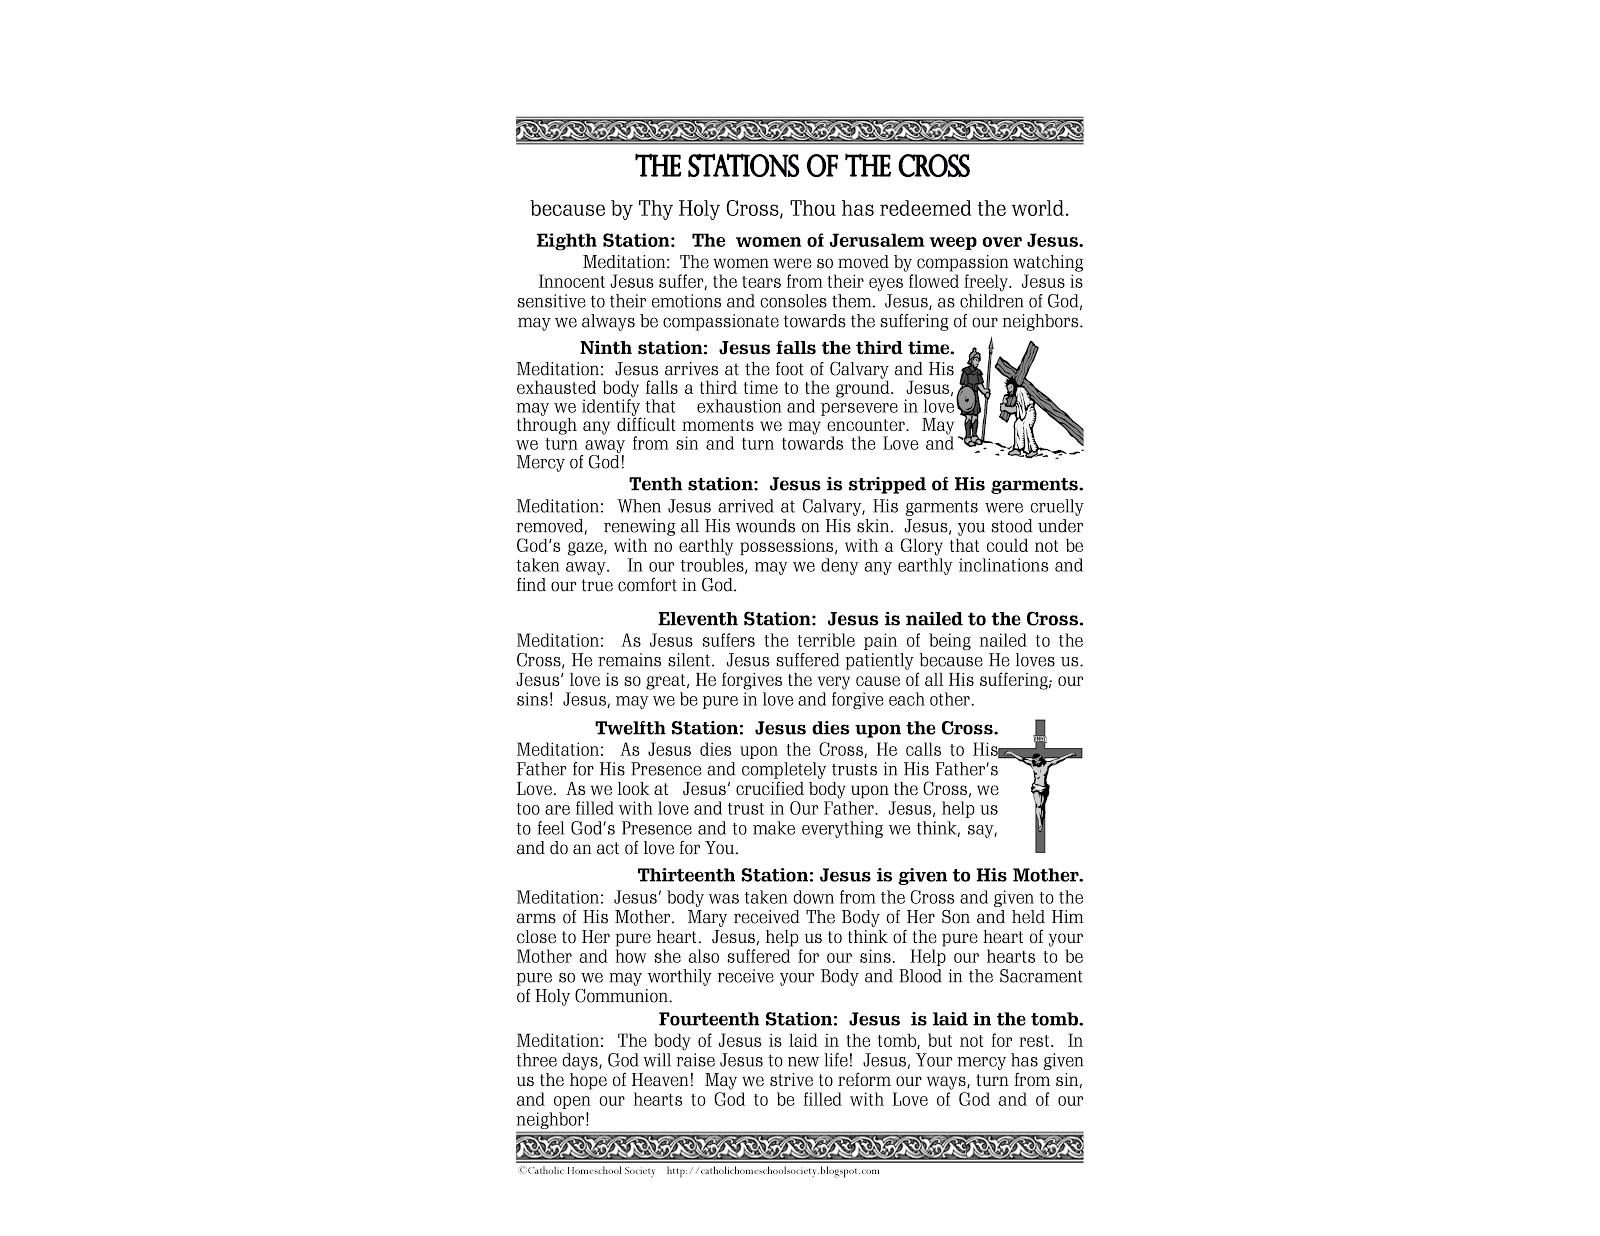 The Catholic Homeschool Society